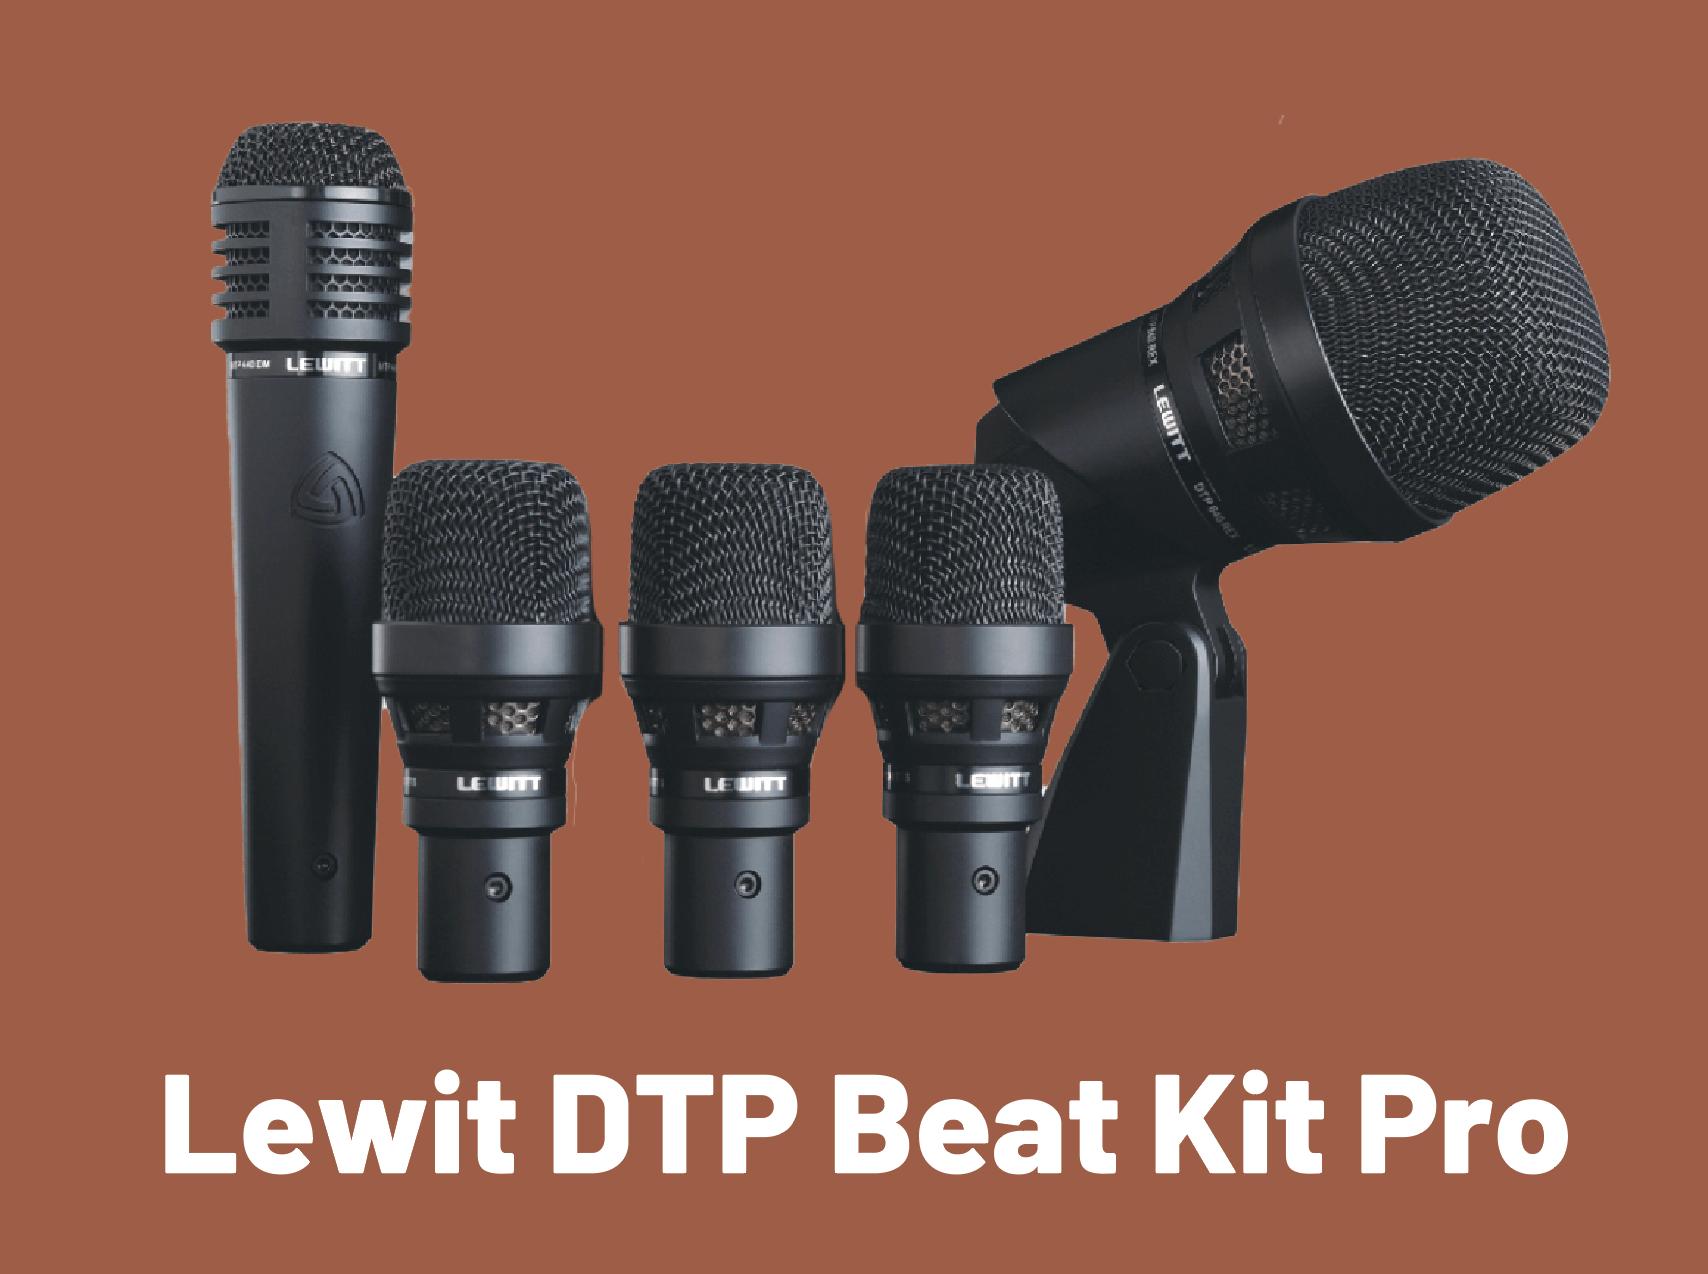 19.6_baba_lewit dtp beat kit pro.png